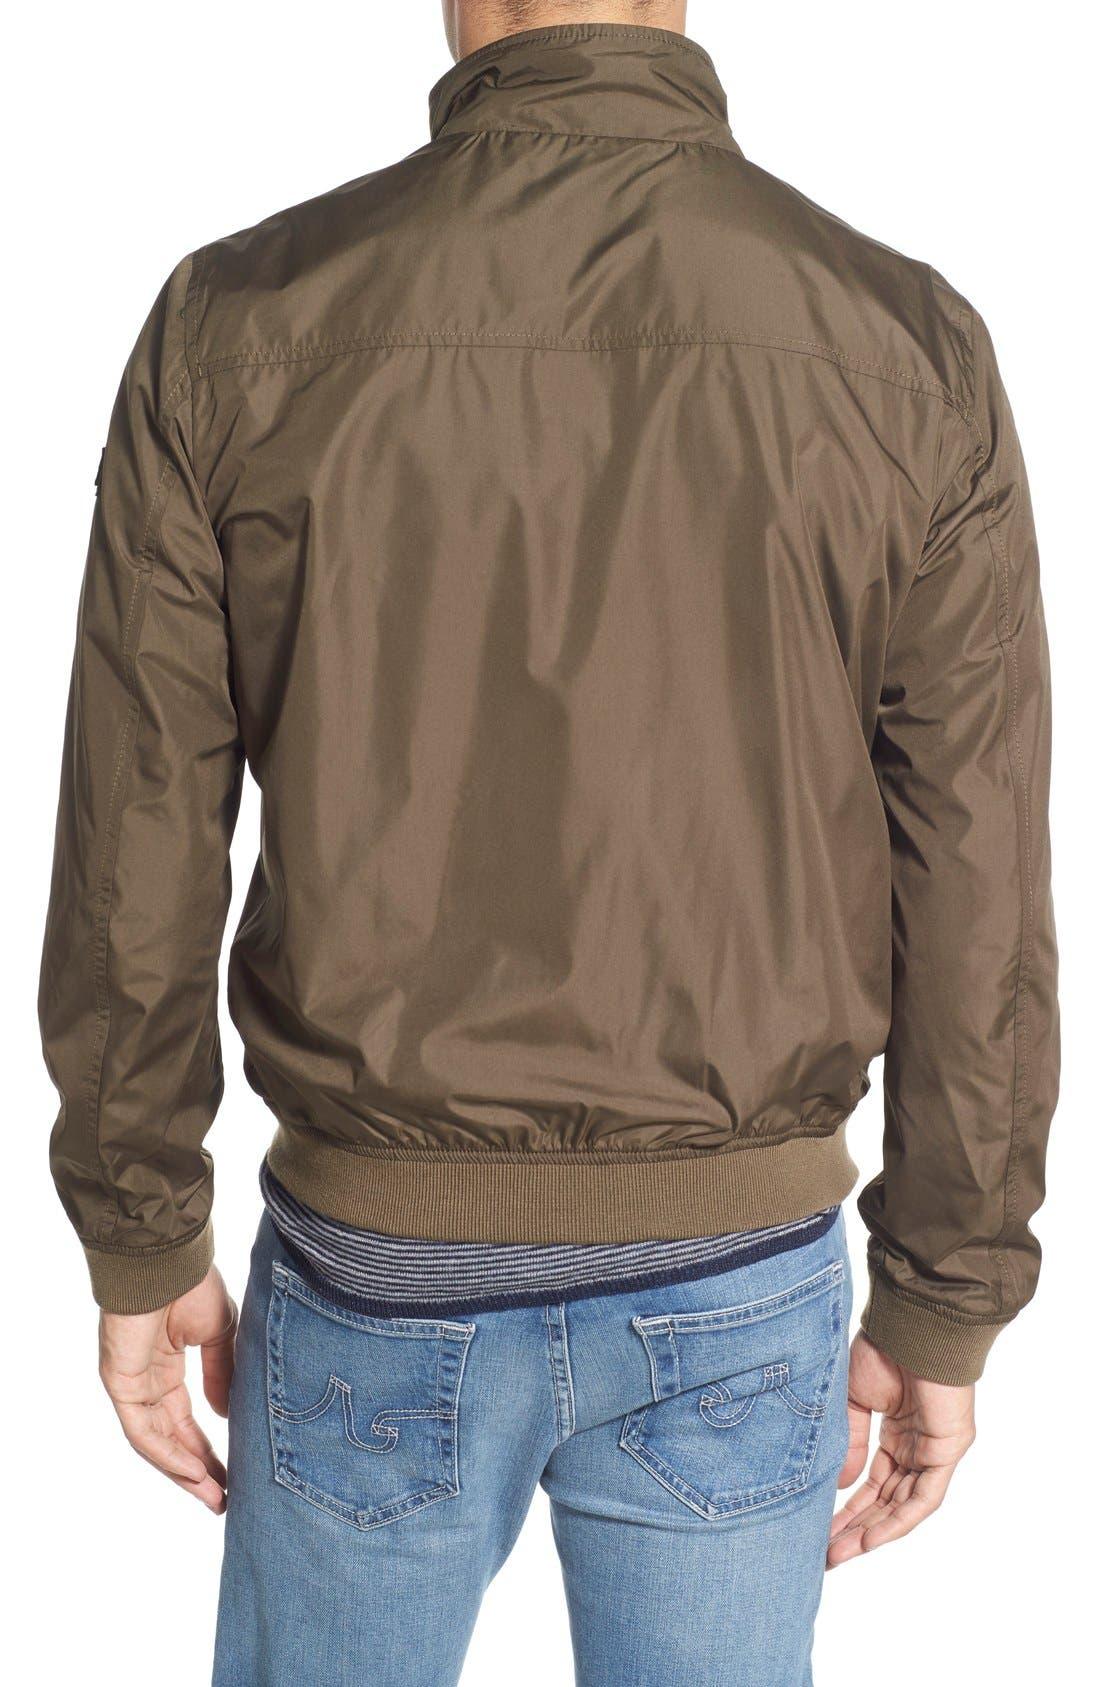 John Rich Reversible Jacket,                             Alternate thumbnail 4, color,                             308